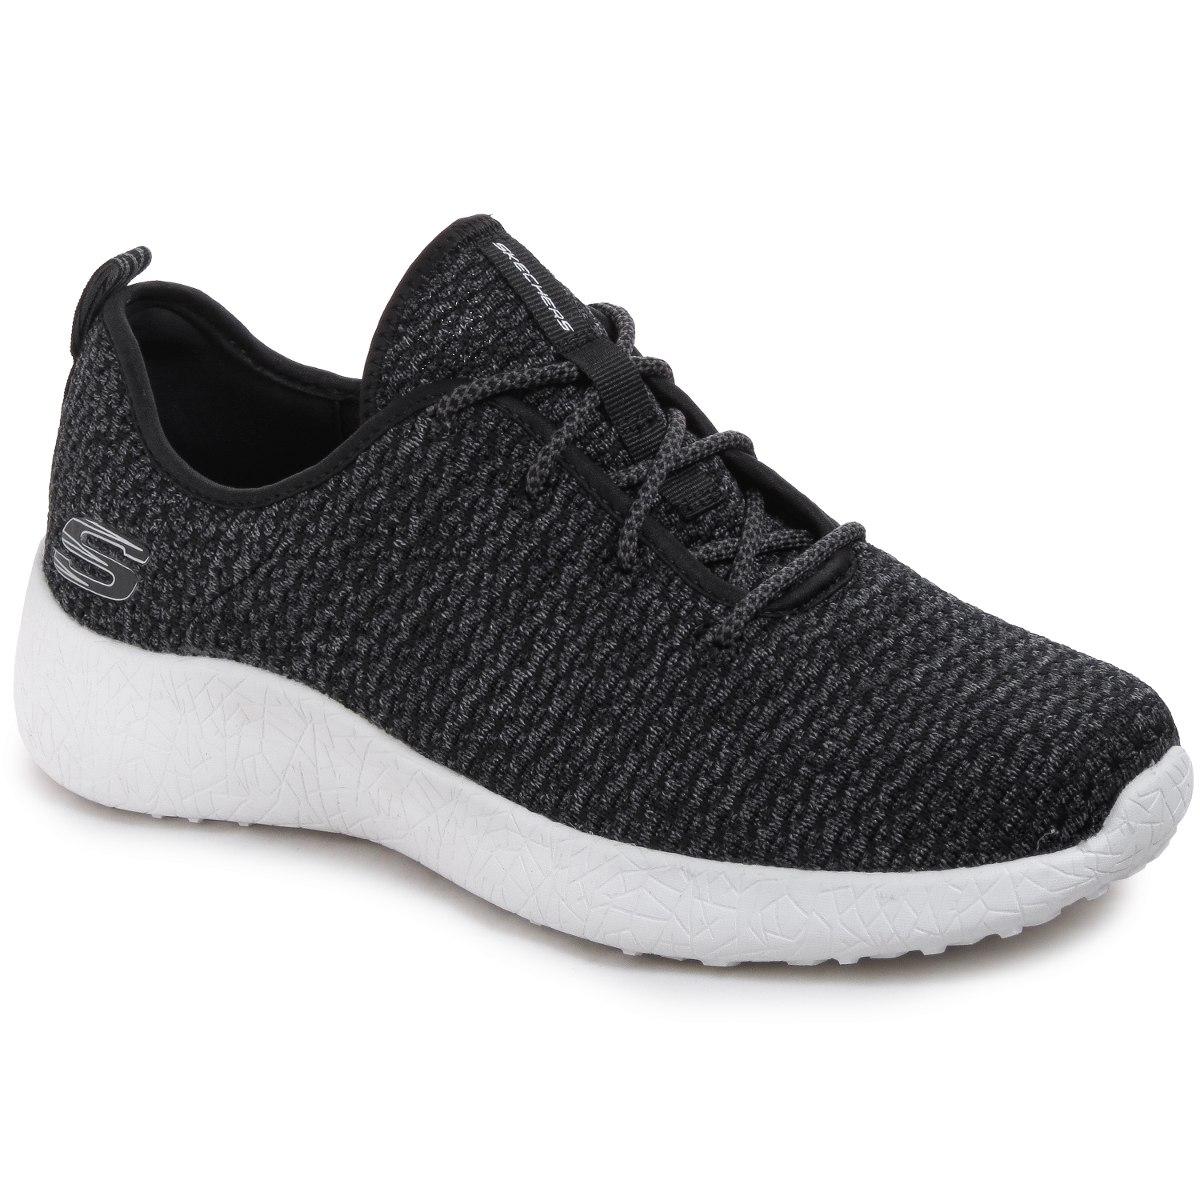 Skechers Burst-Donlen, Zapatillas para Hombre, Negro (Black), 41.5 EU